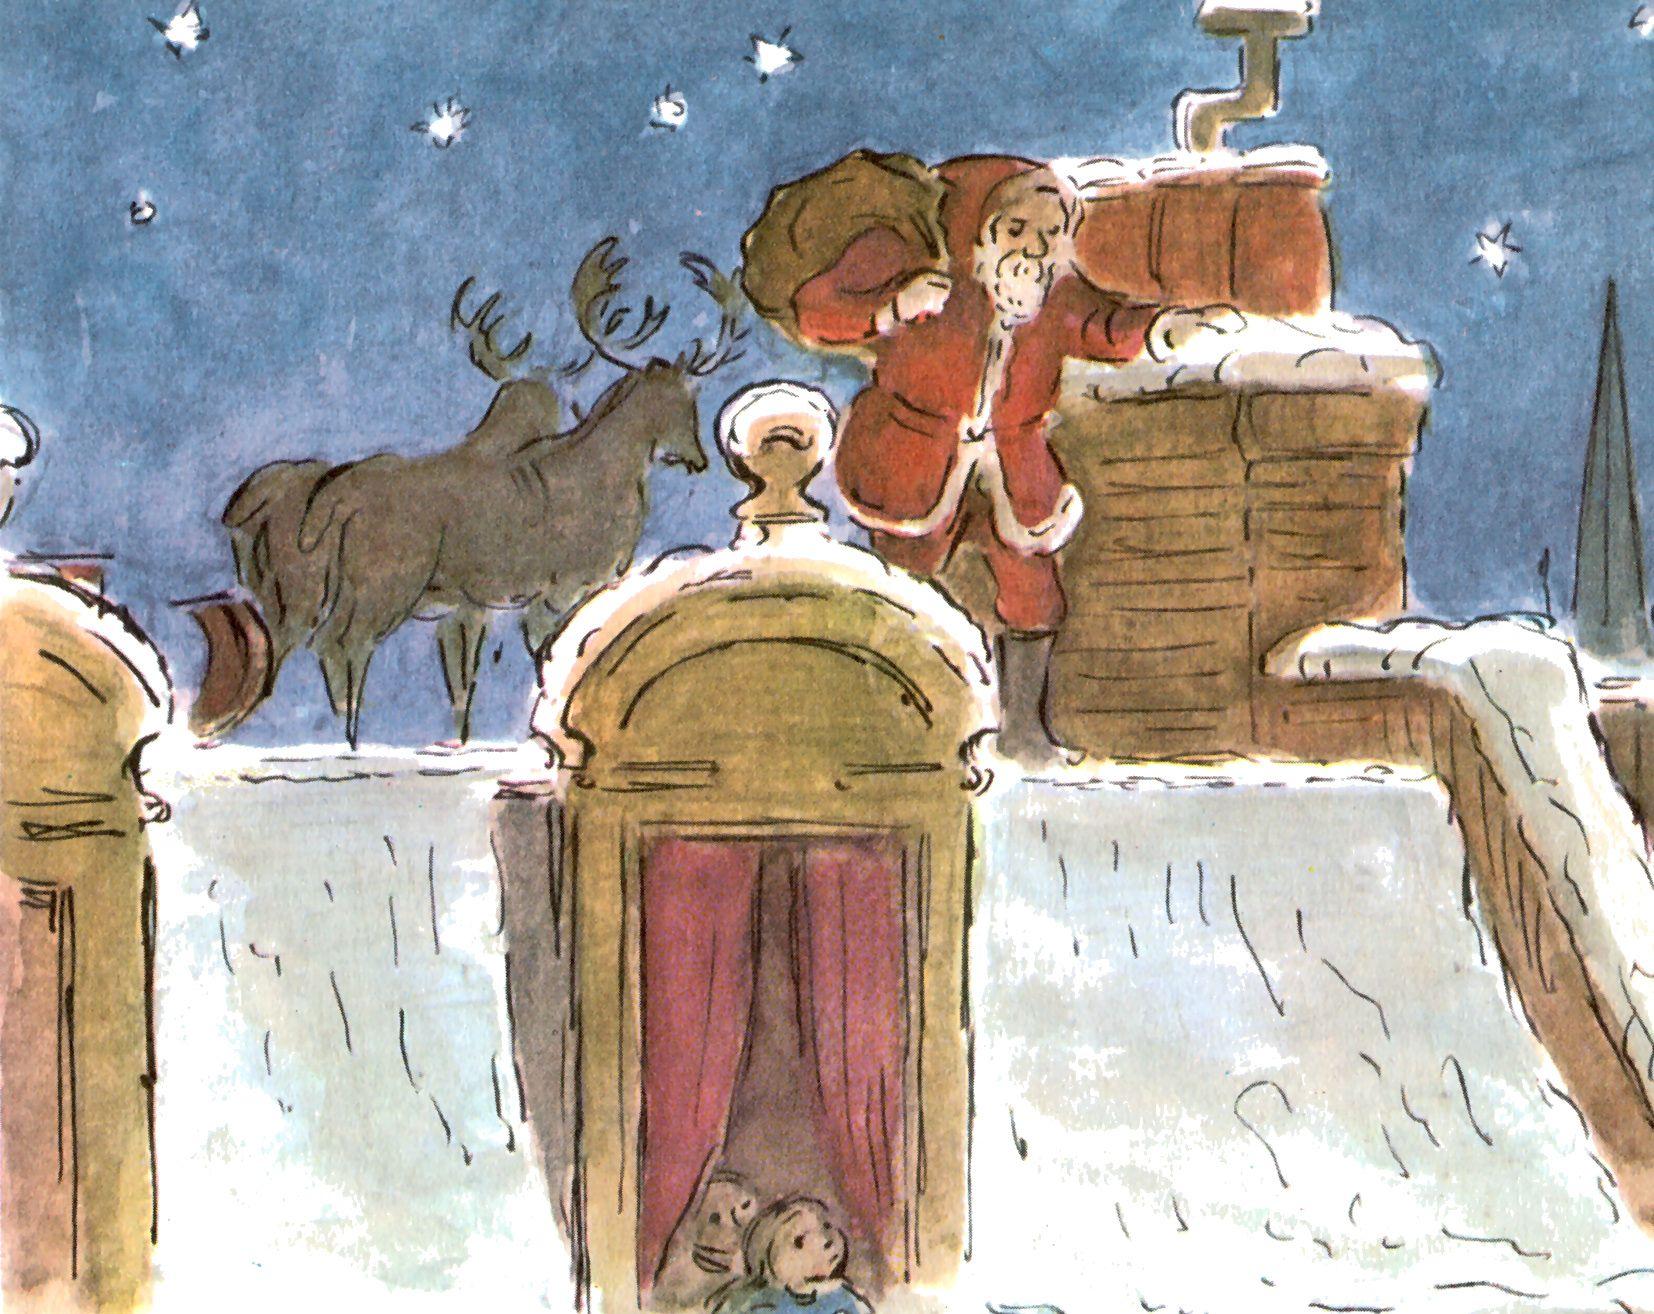 Madeline S Memories Vintage Christmas Cards: Santa Claus - EDWARD ARDIZZONE